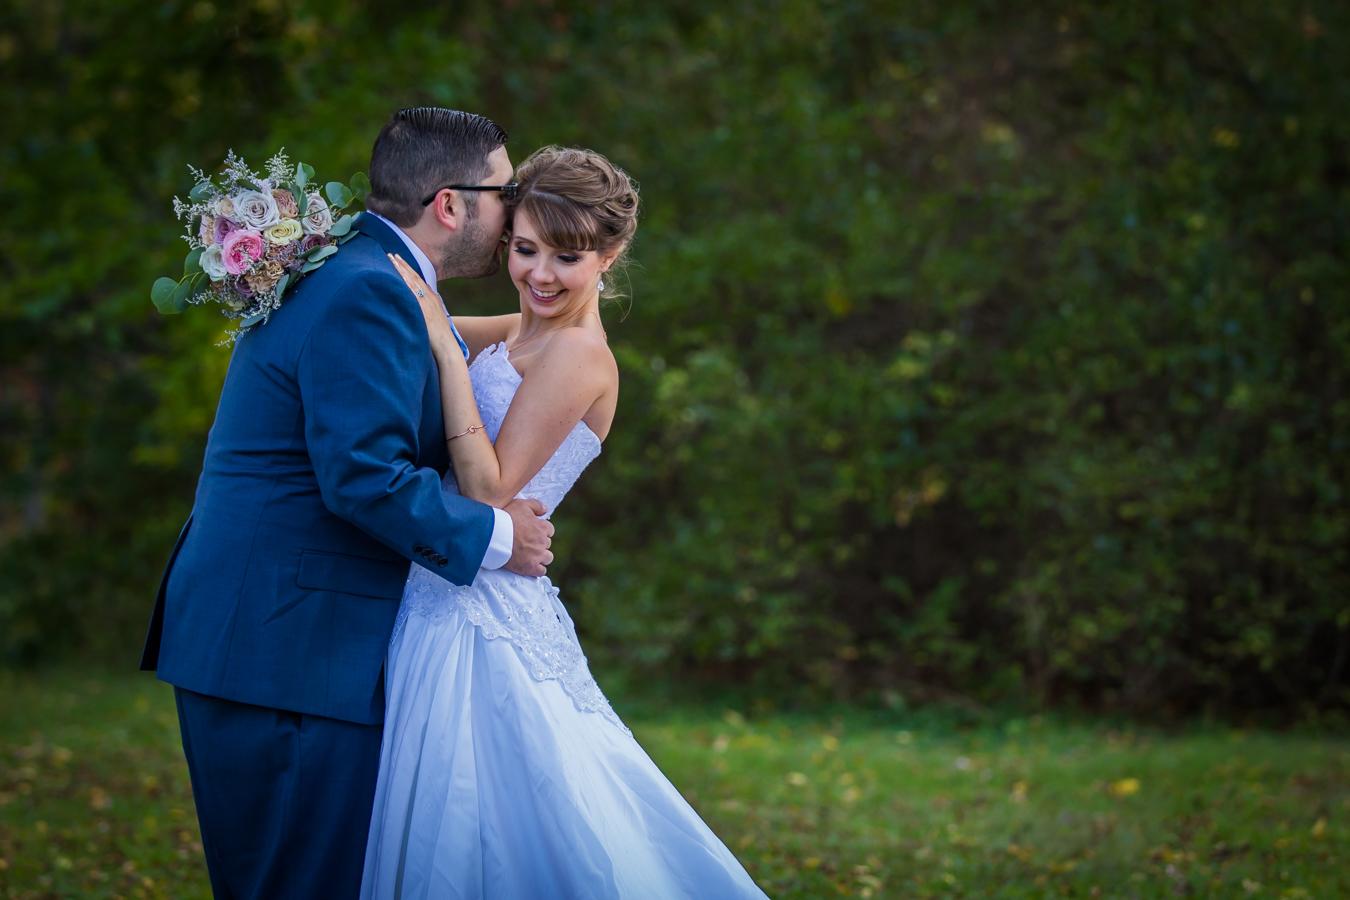 Detroit wedding photography, Michigan wedding photography, photographer for wedding, dd2dj.com